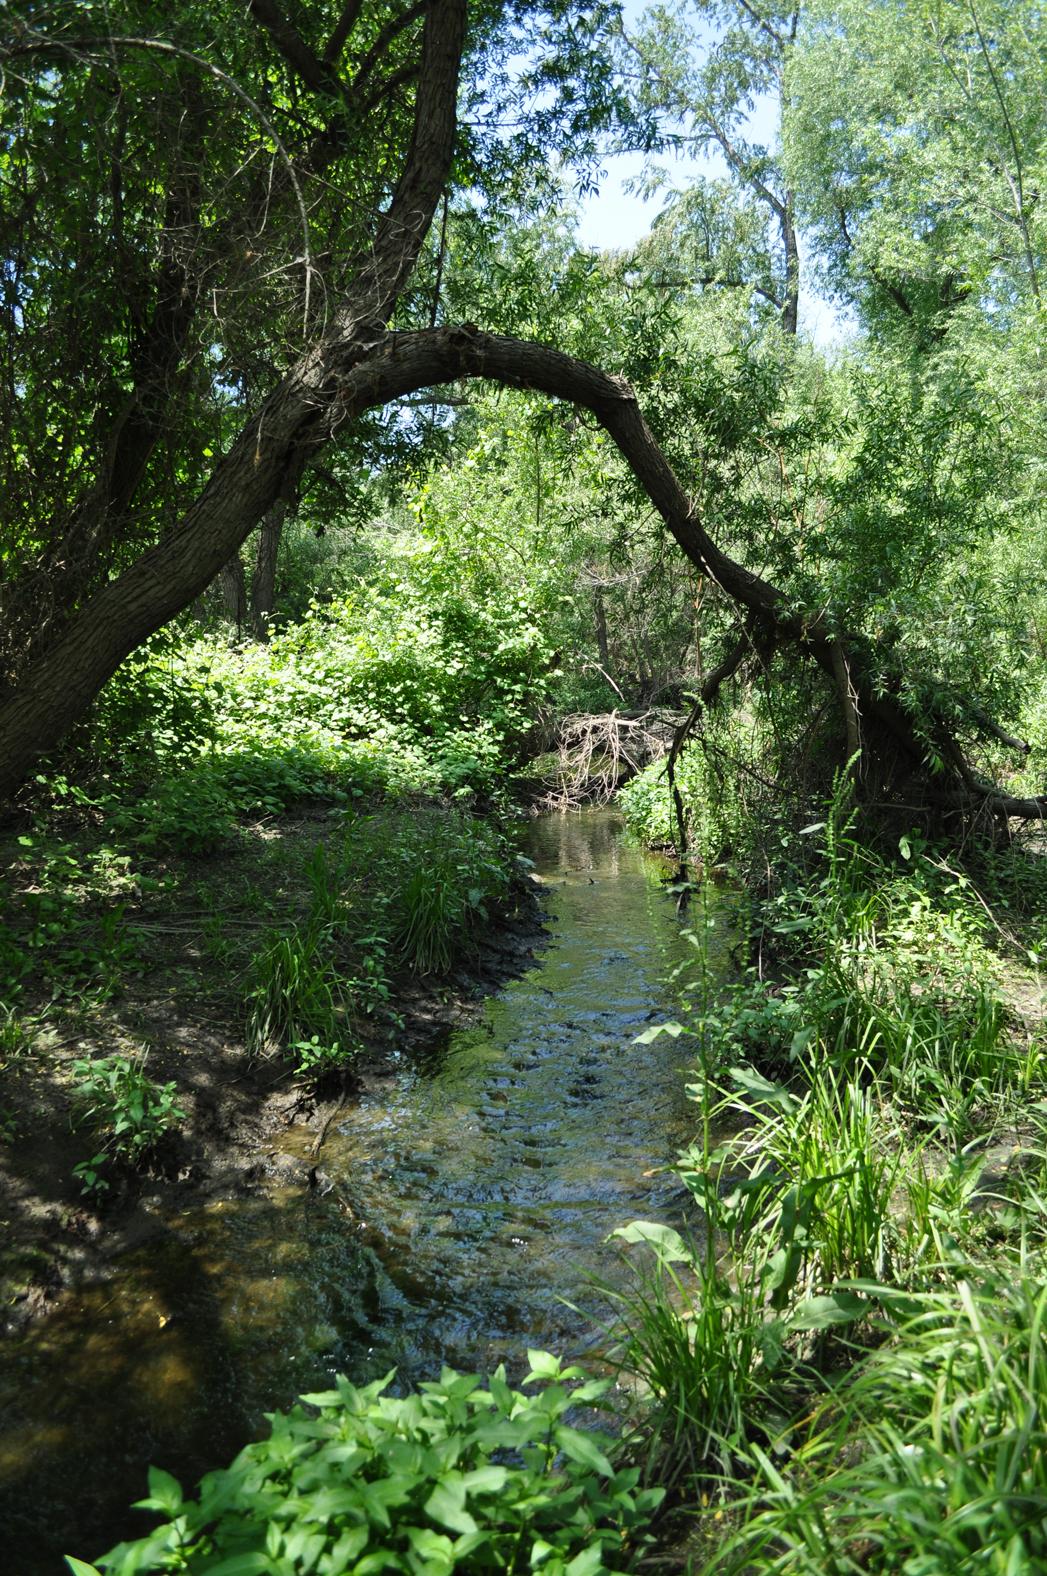 stream flowing through a green field